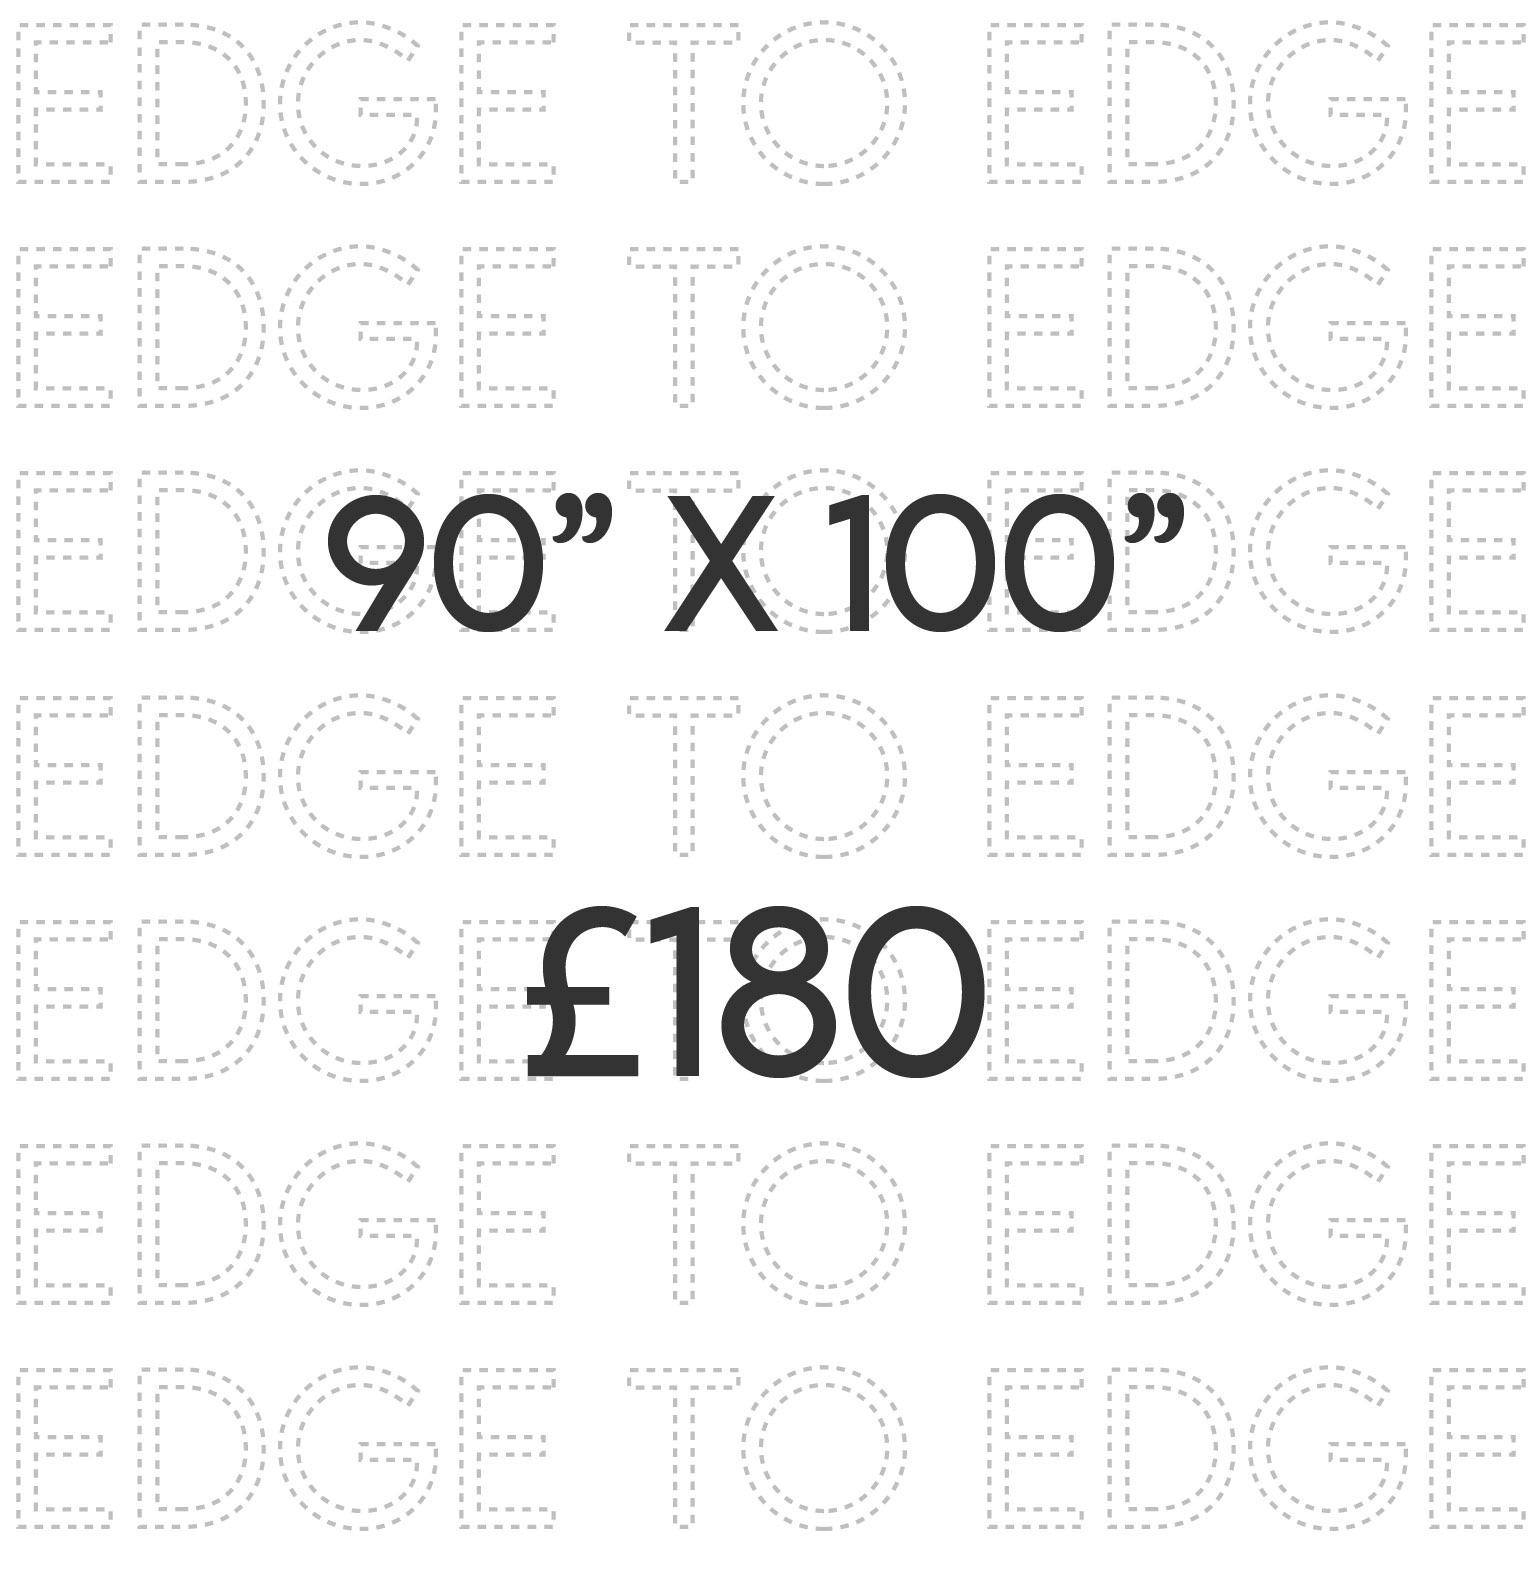 90 x 100